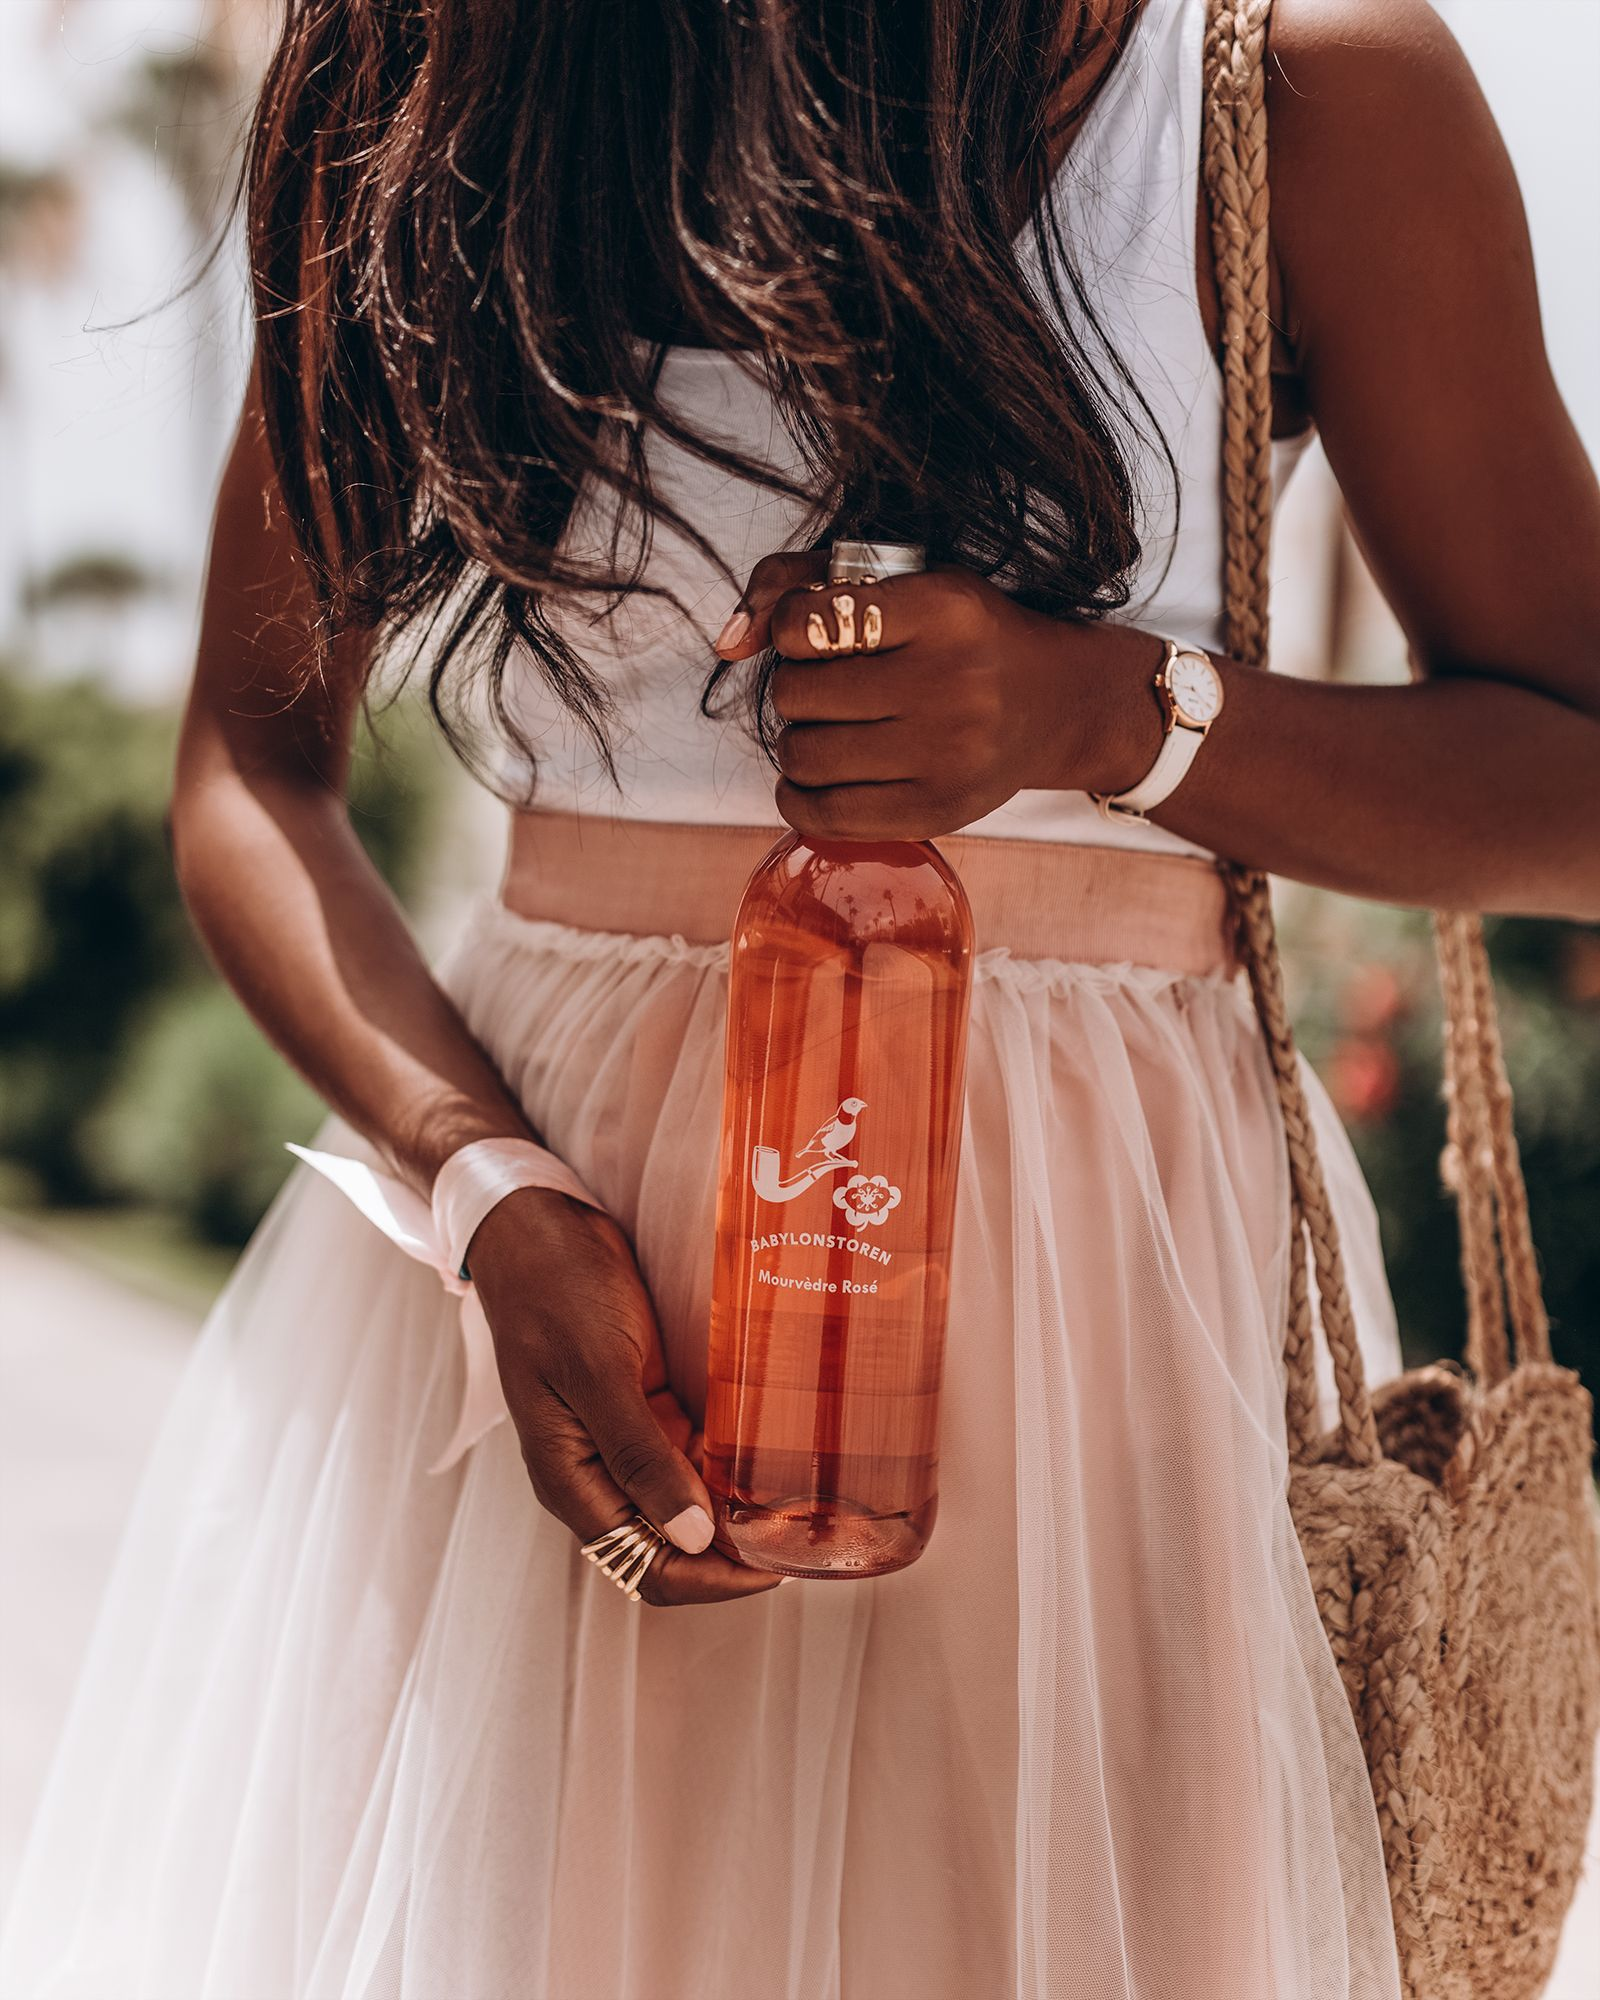 Rose Wine South African Wine Dry Wine Rose Wine